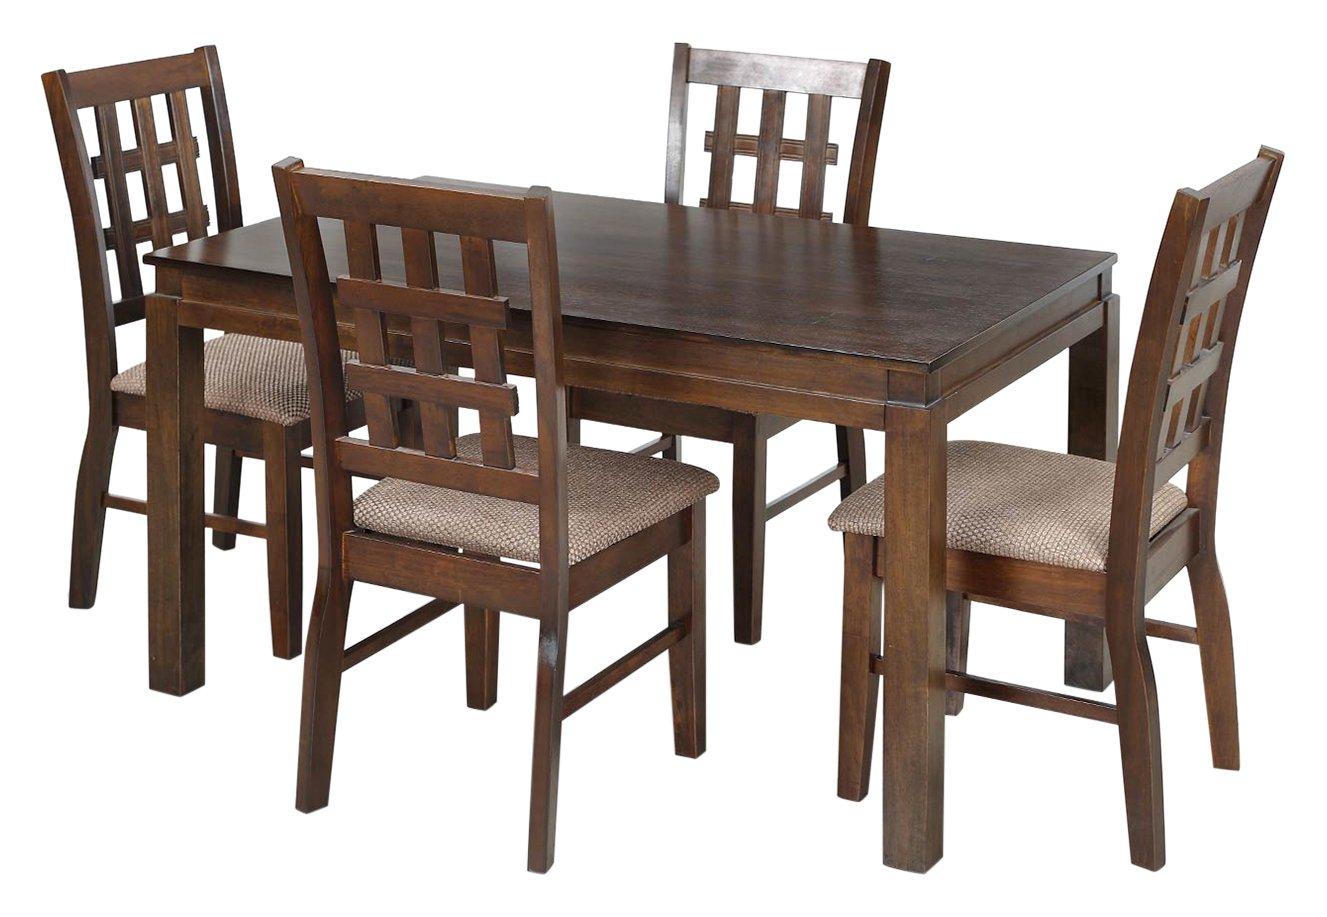 Royaloak daisy four seater dining table set walnut amazon in home kitchen